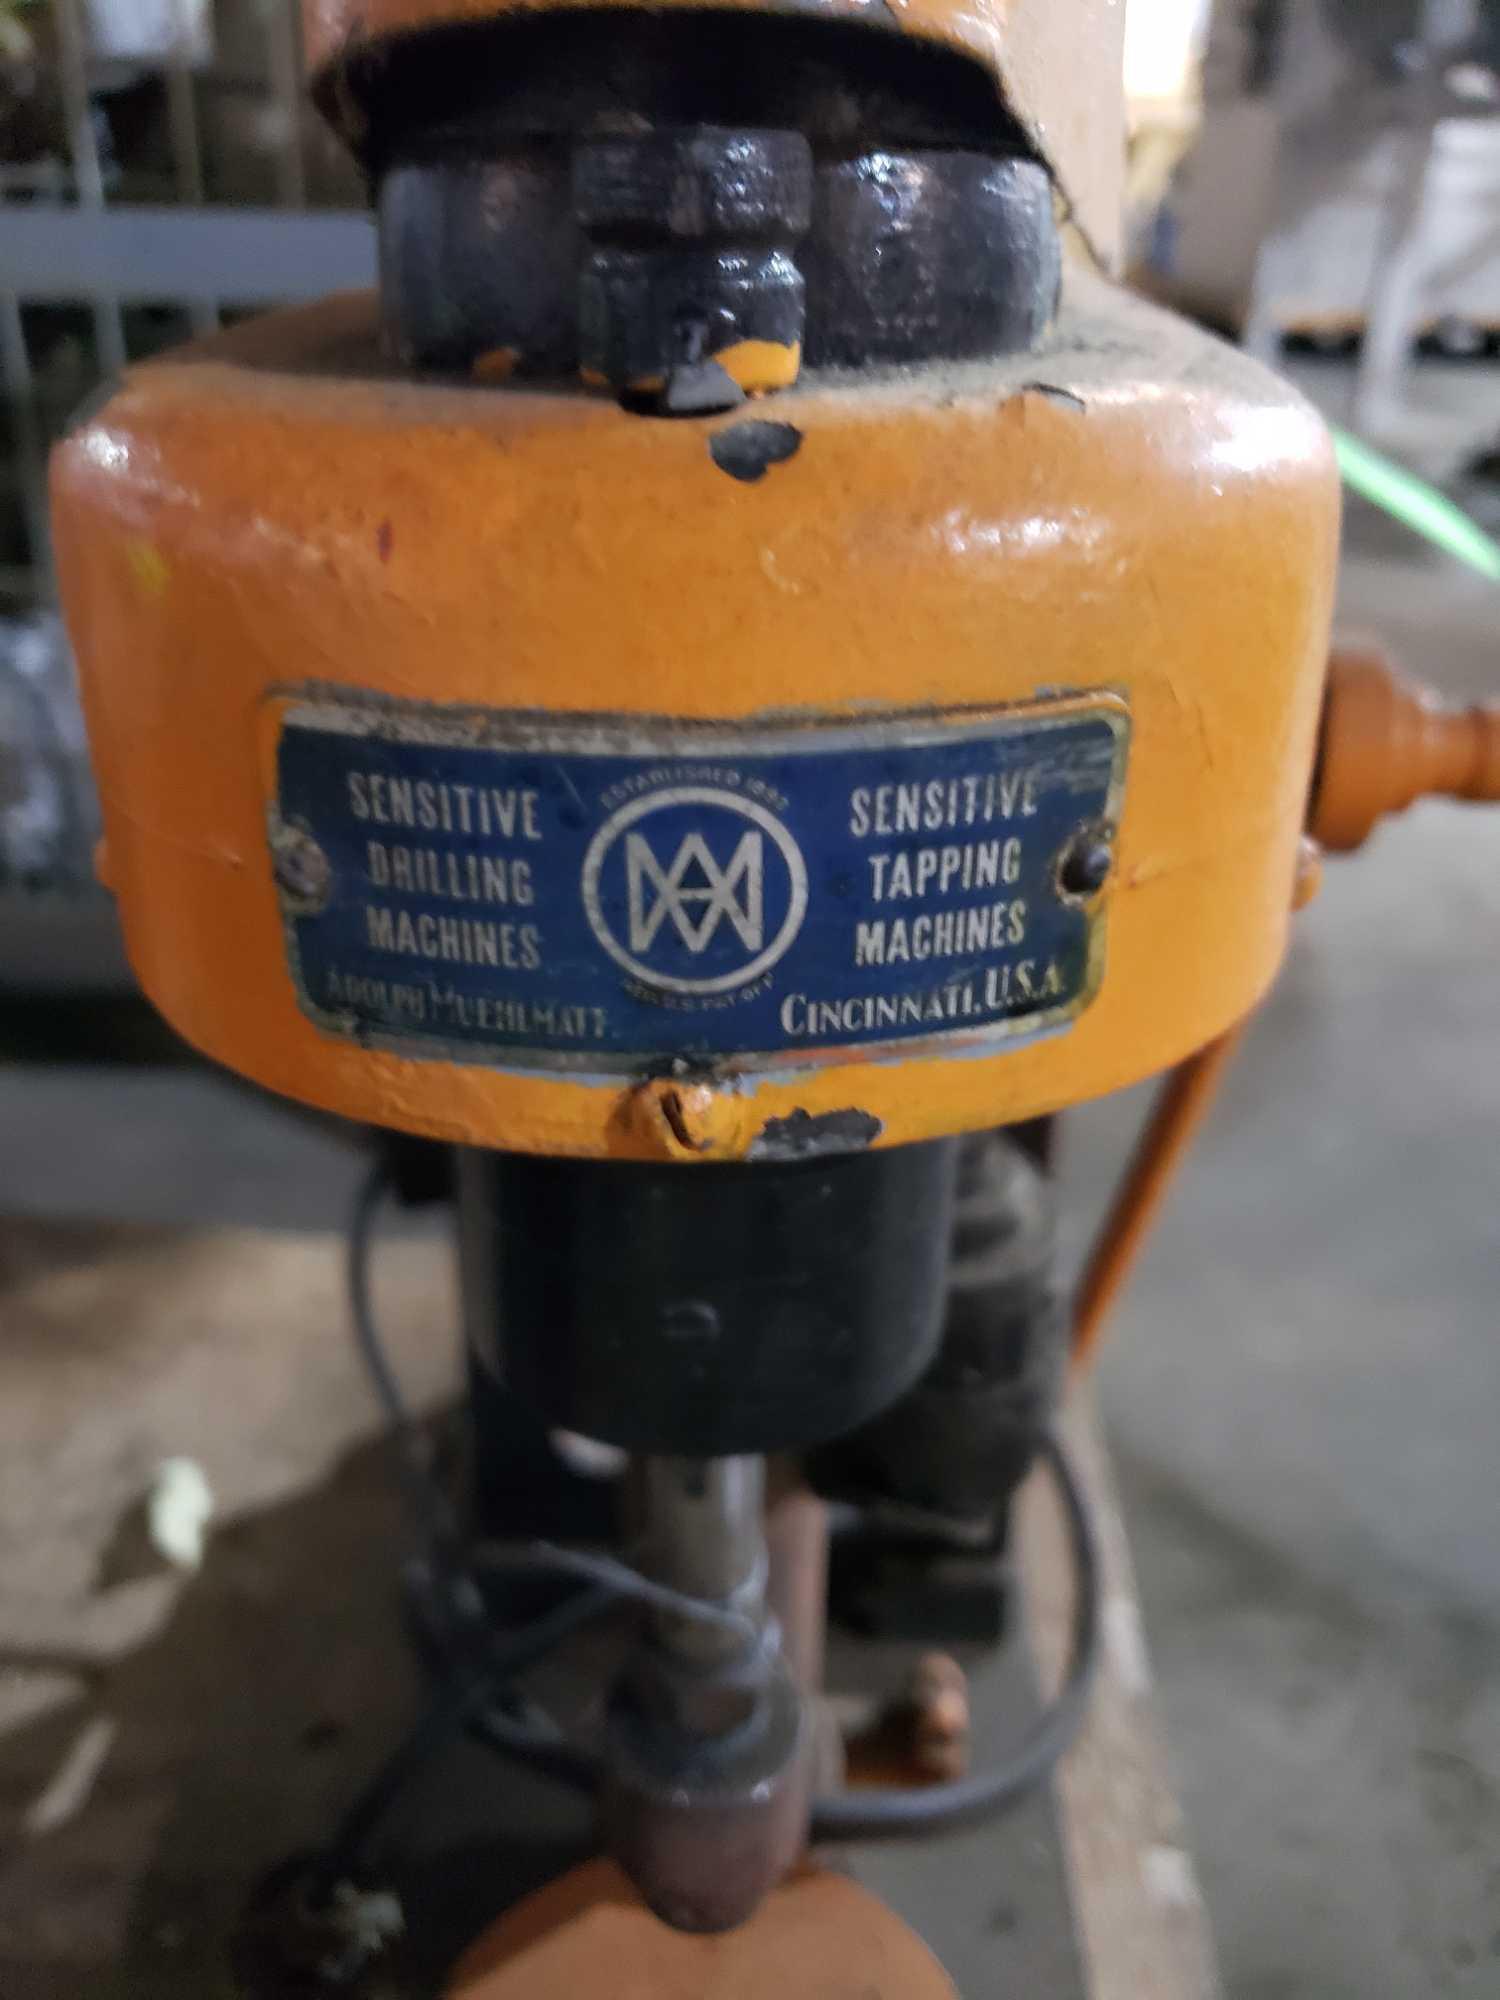 Lot 32 - Sensitive drilling machines precision drill / tapping machine. 110/115v